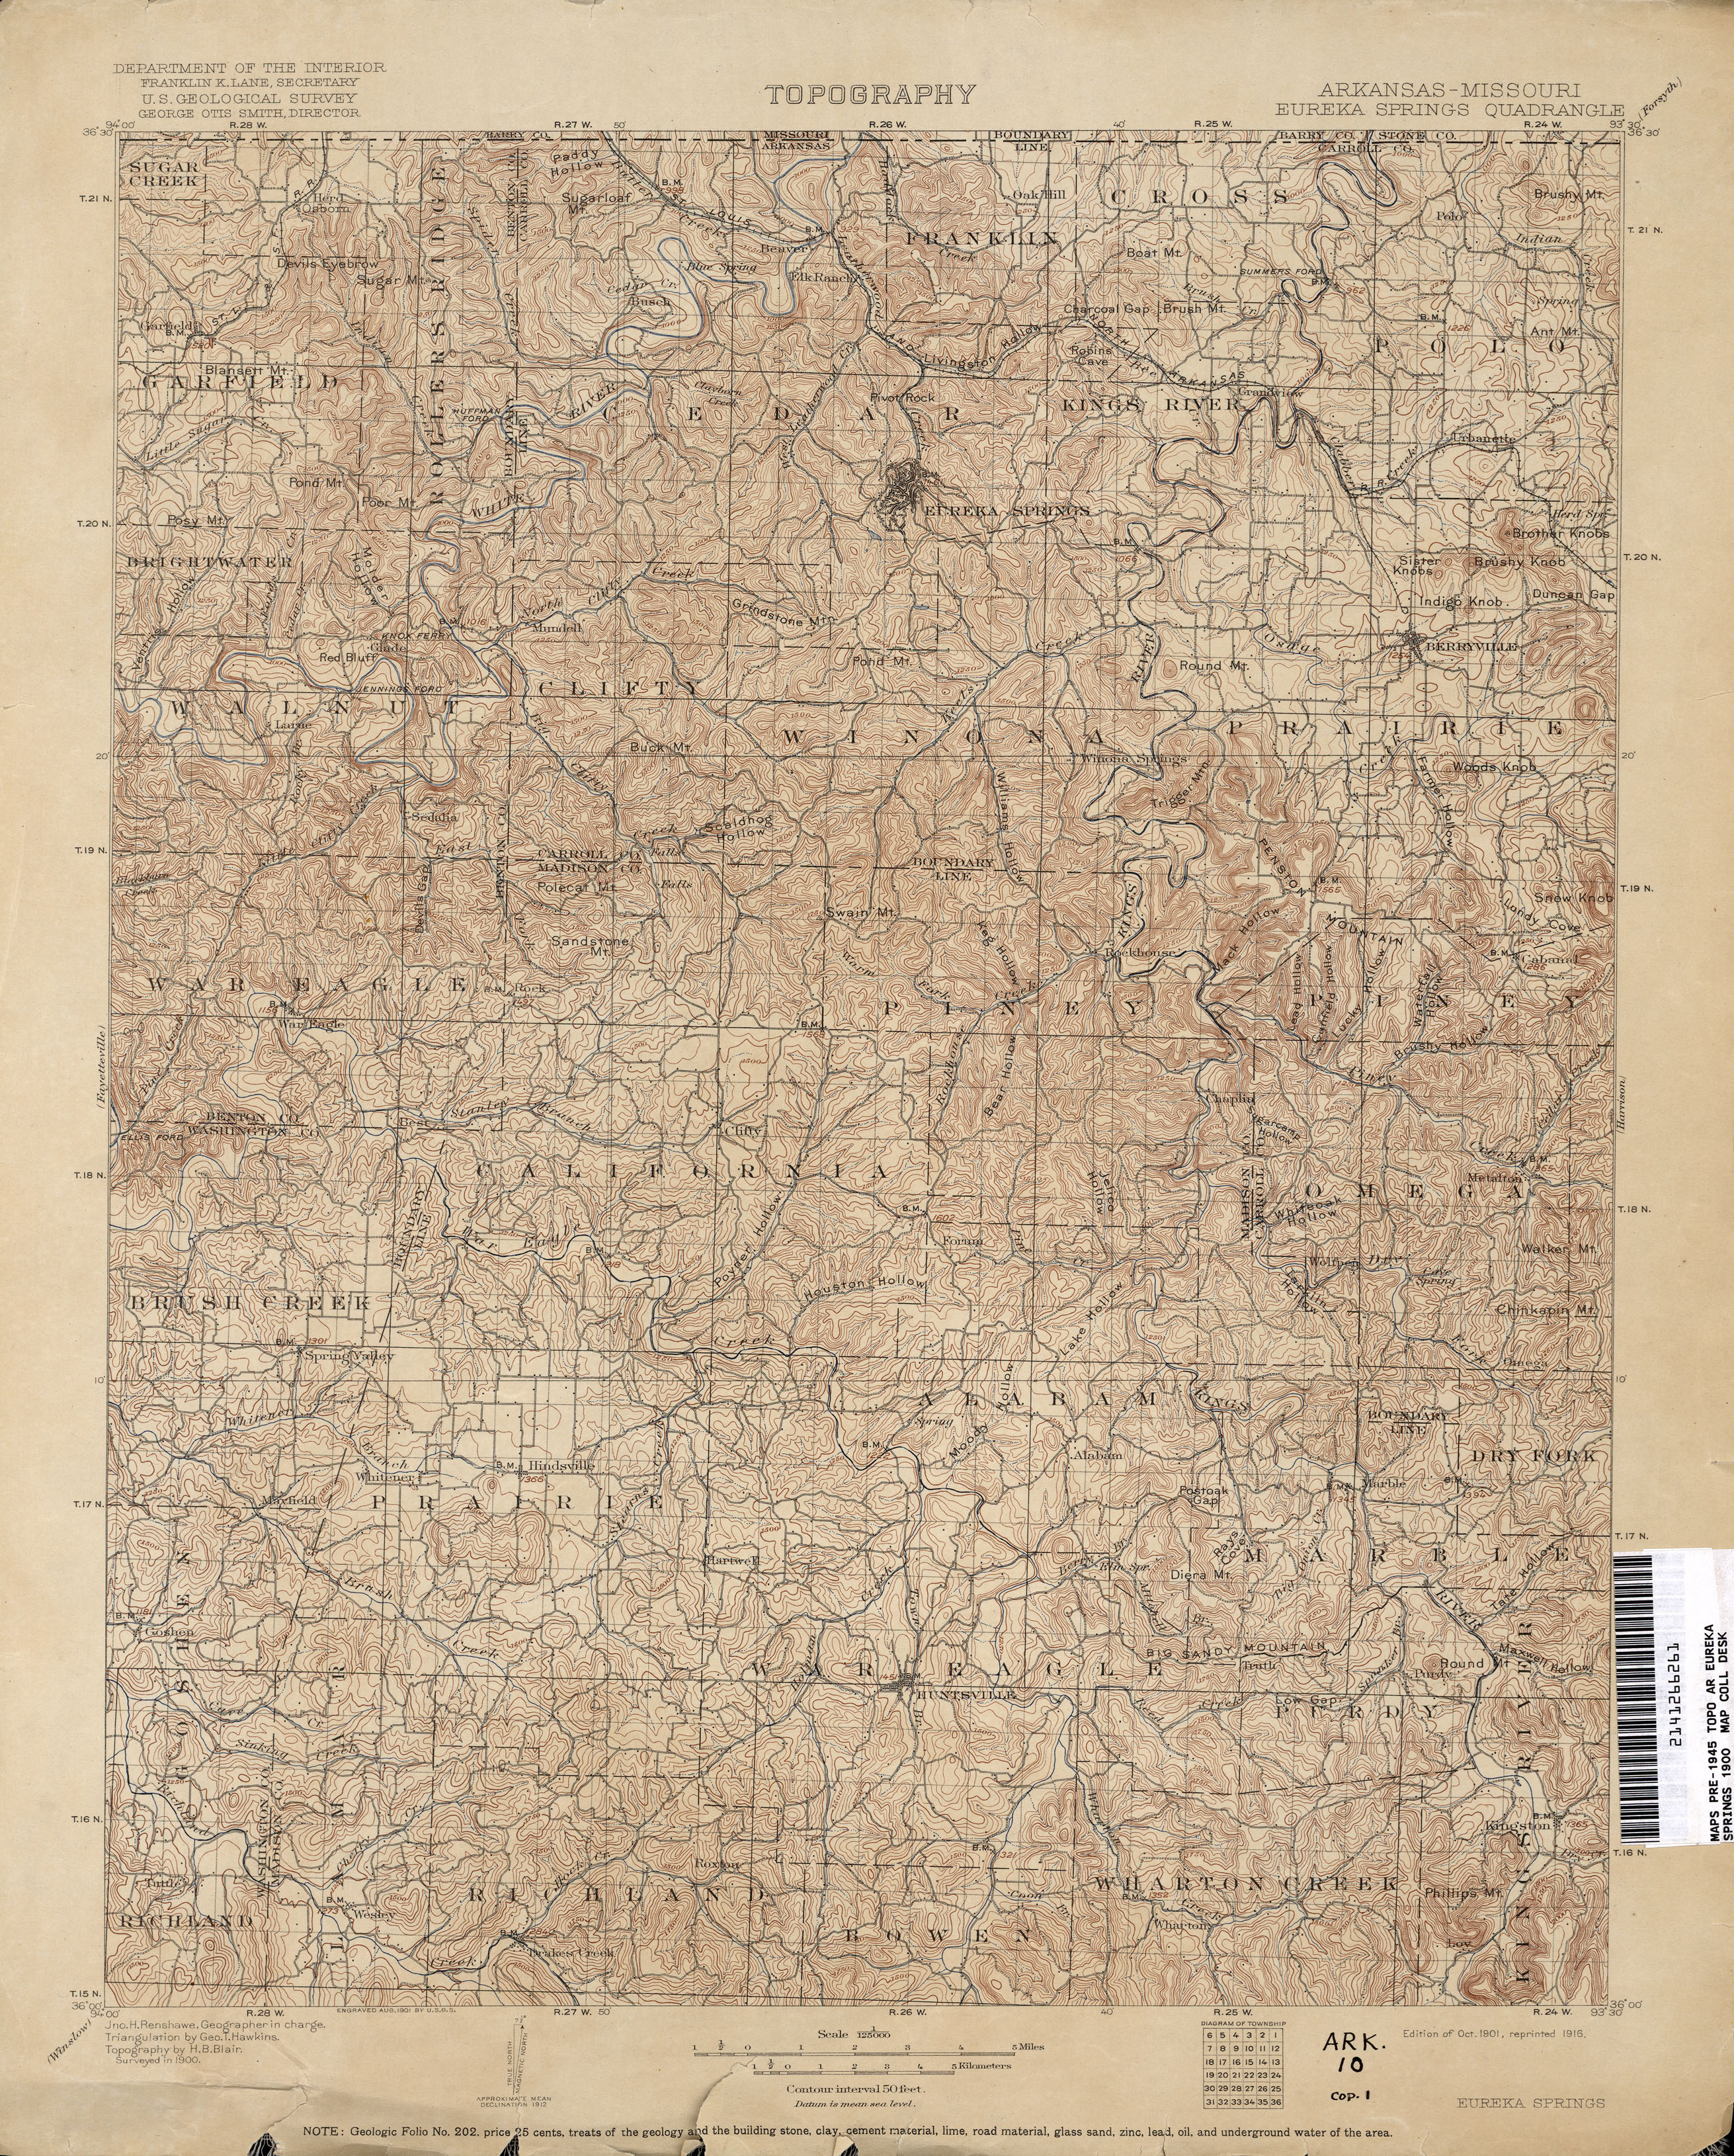 Arkansas Historical Topographic Maps - Perry-Castañeda Map ...